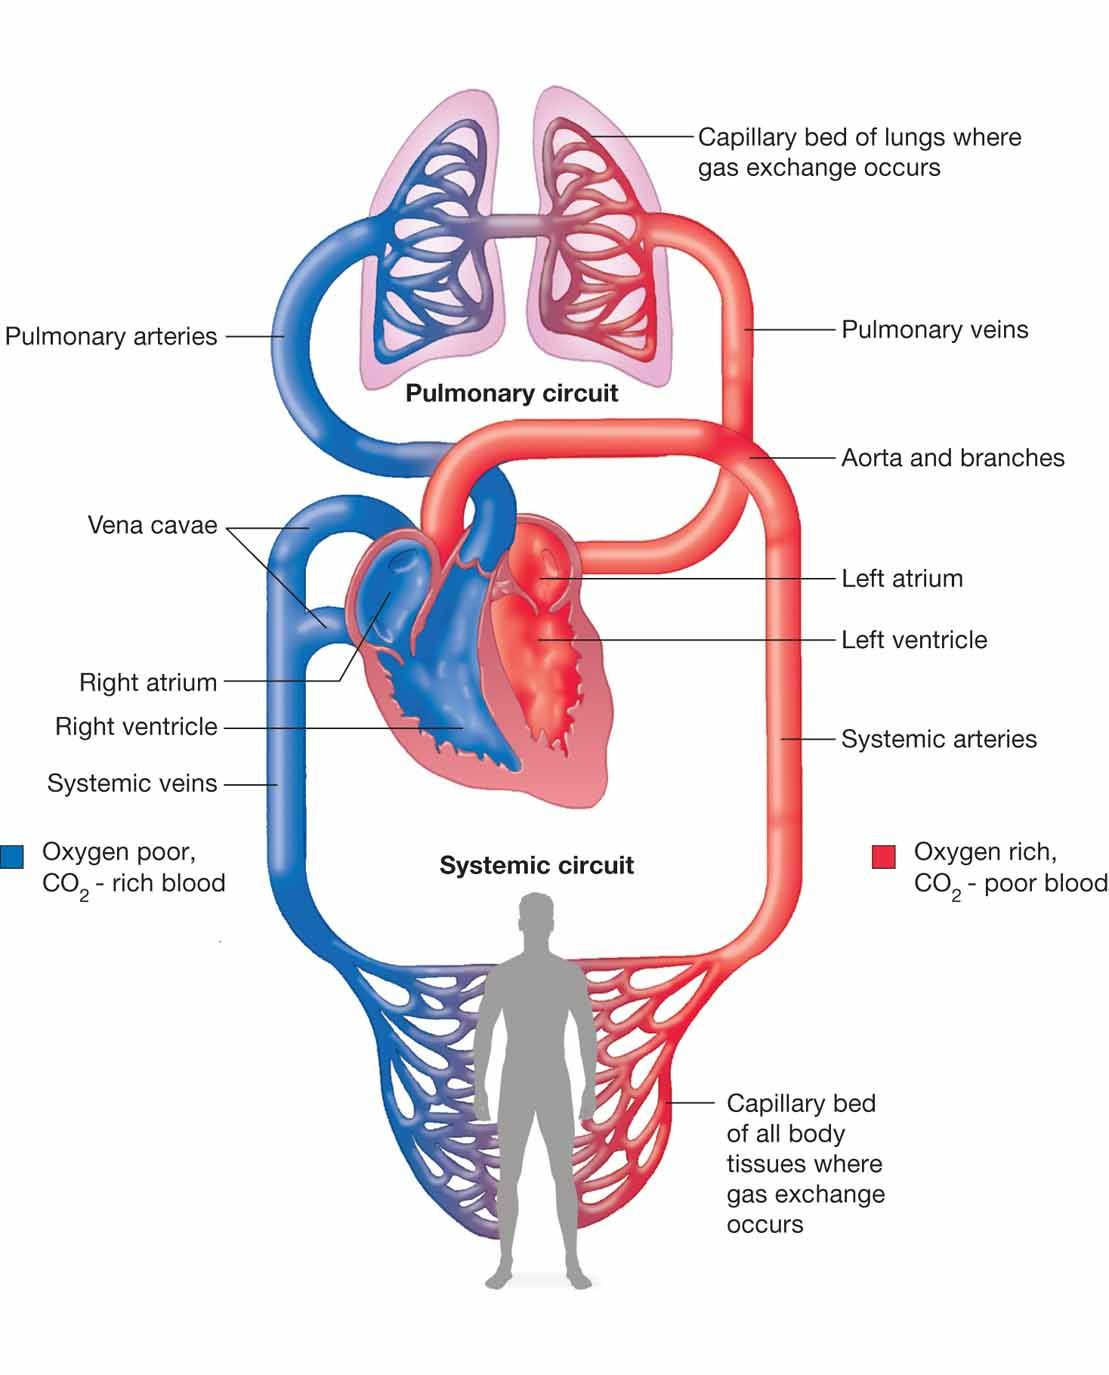 diagram of blood flow in body wiring diagram sample around body blood flow diagram [ 1109 x 1375 Pixel ]